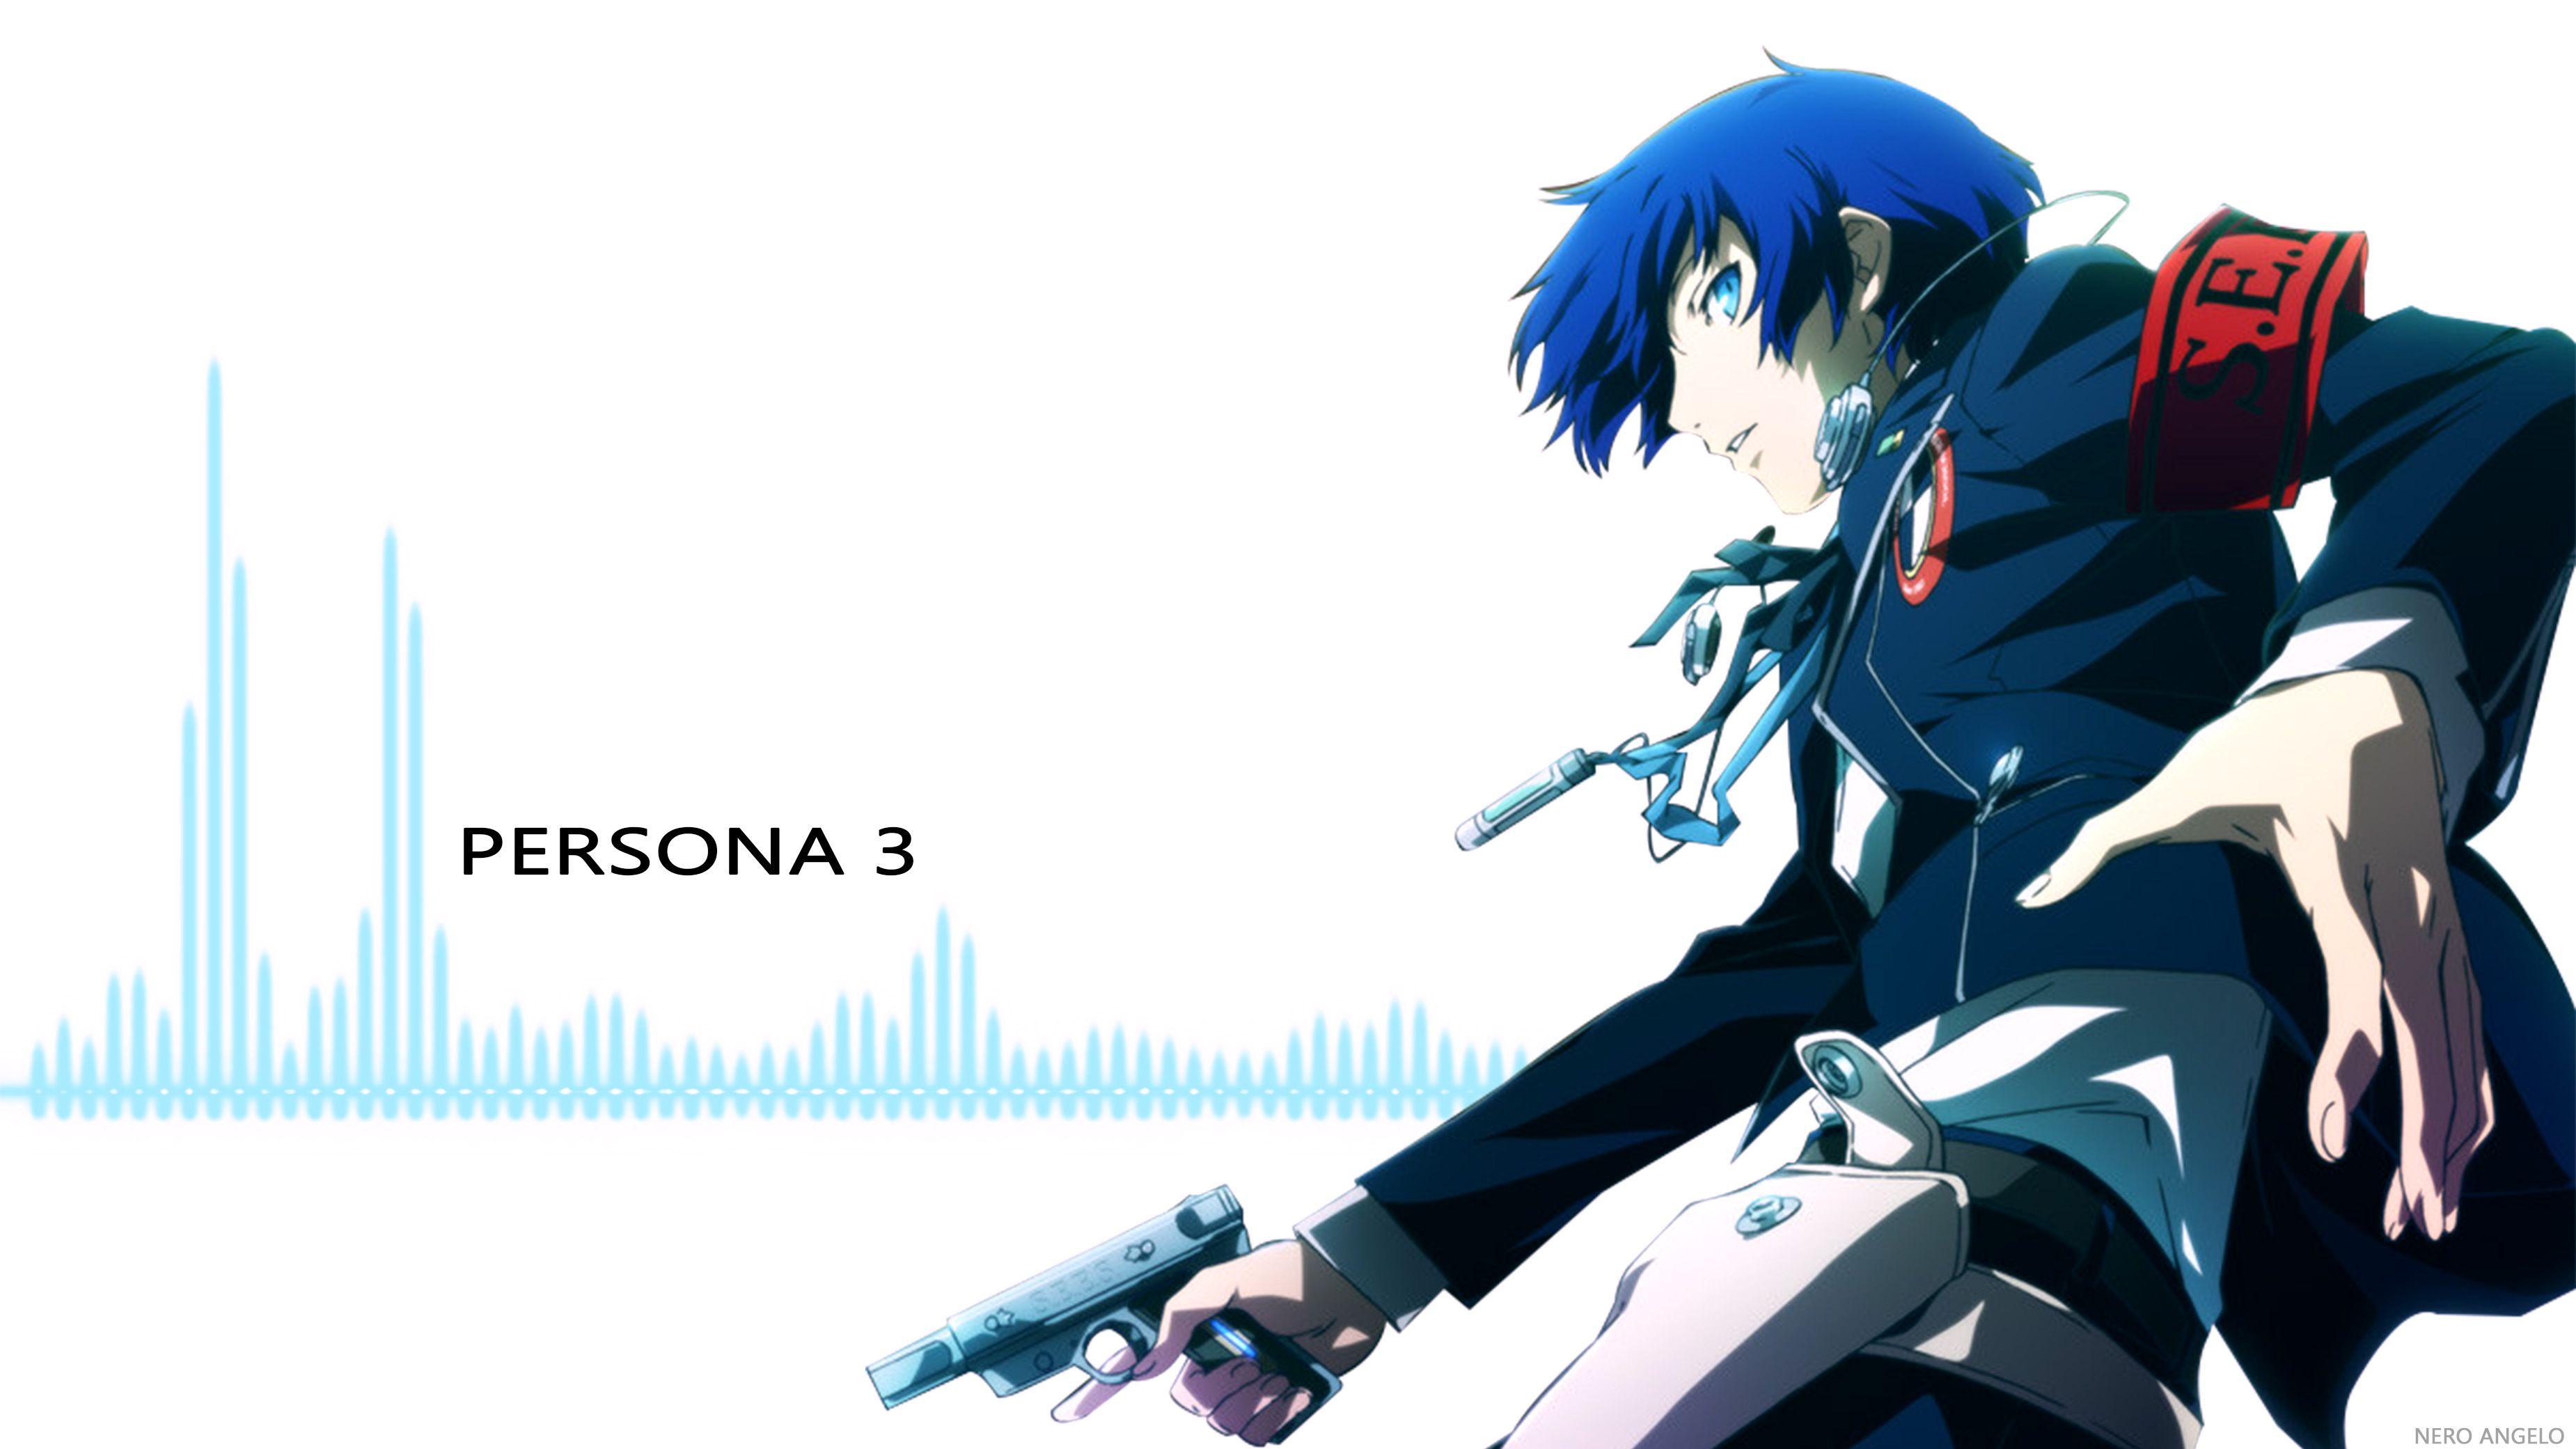 Video Game Persona 3 Persona Makoto Yuki Wallpaper Persona